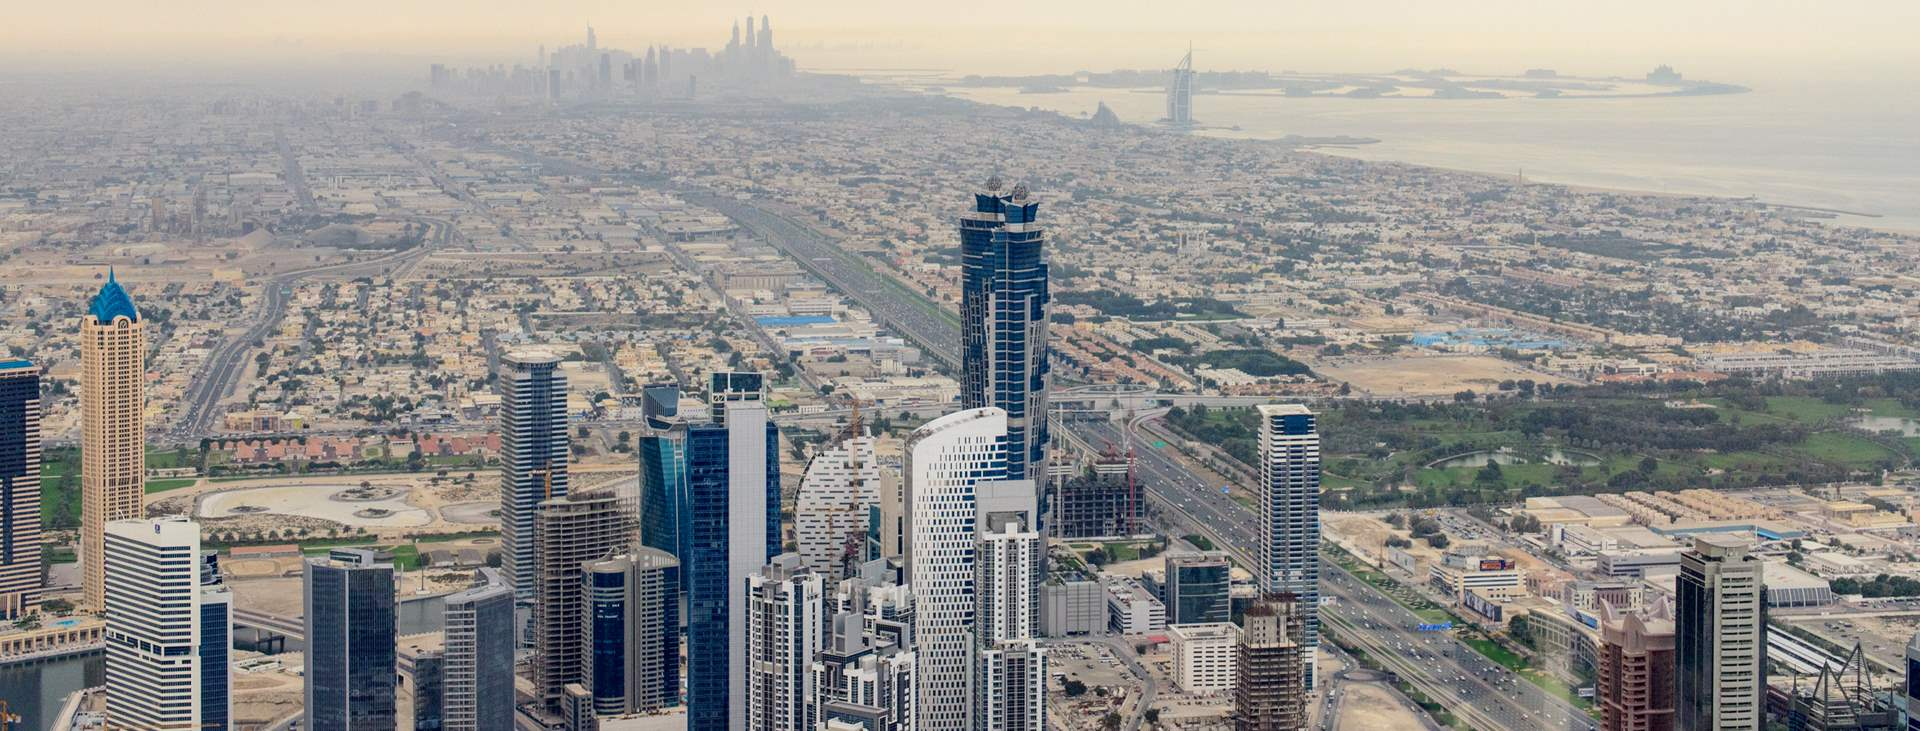 Boka en resa till Downtown Dubai med Ving